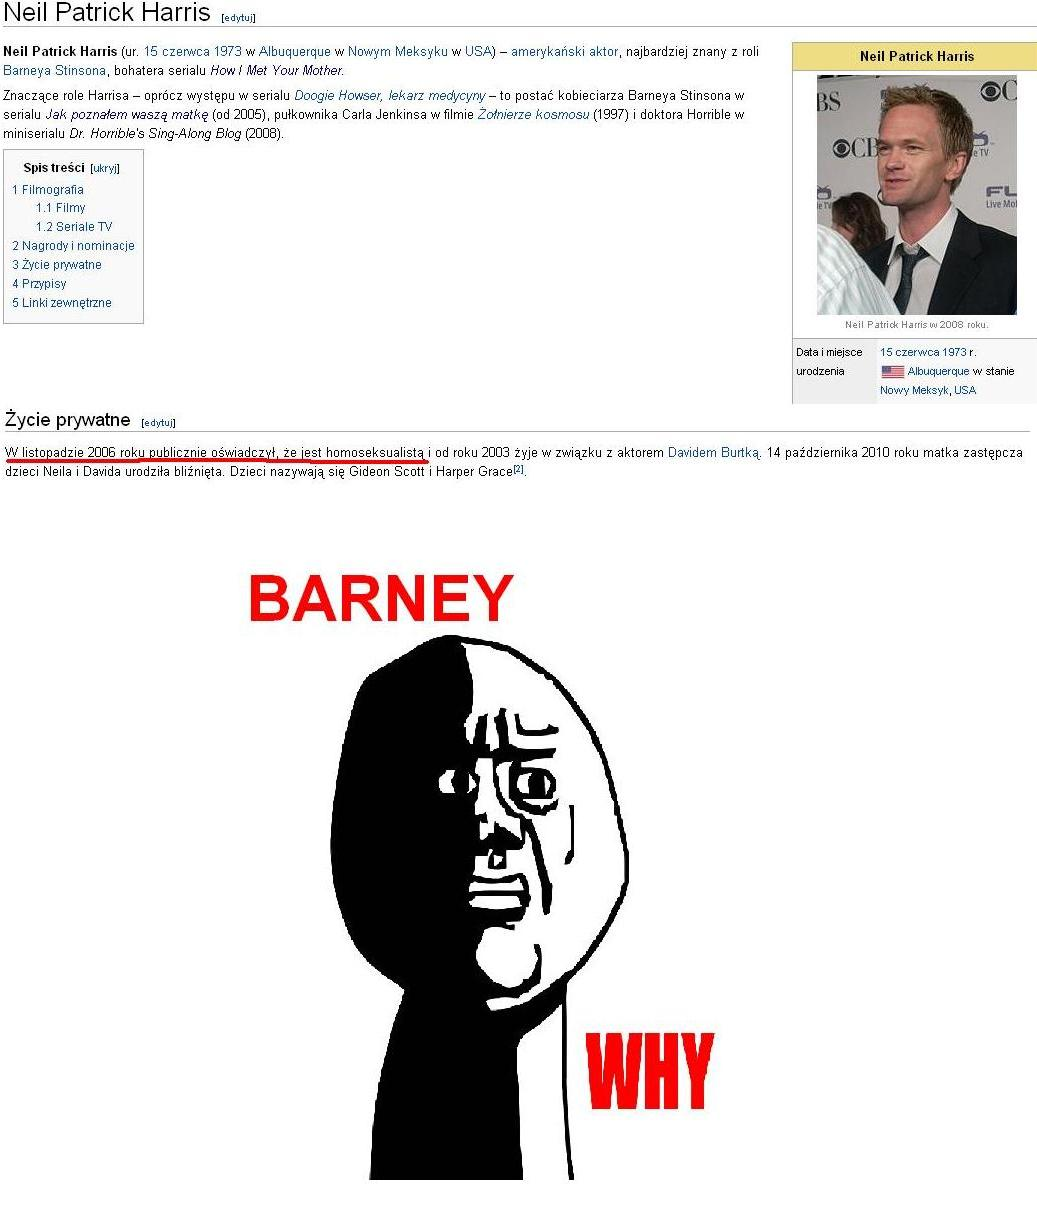 Barney why ?